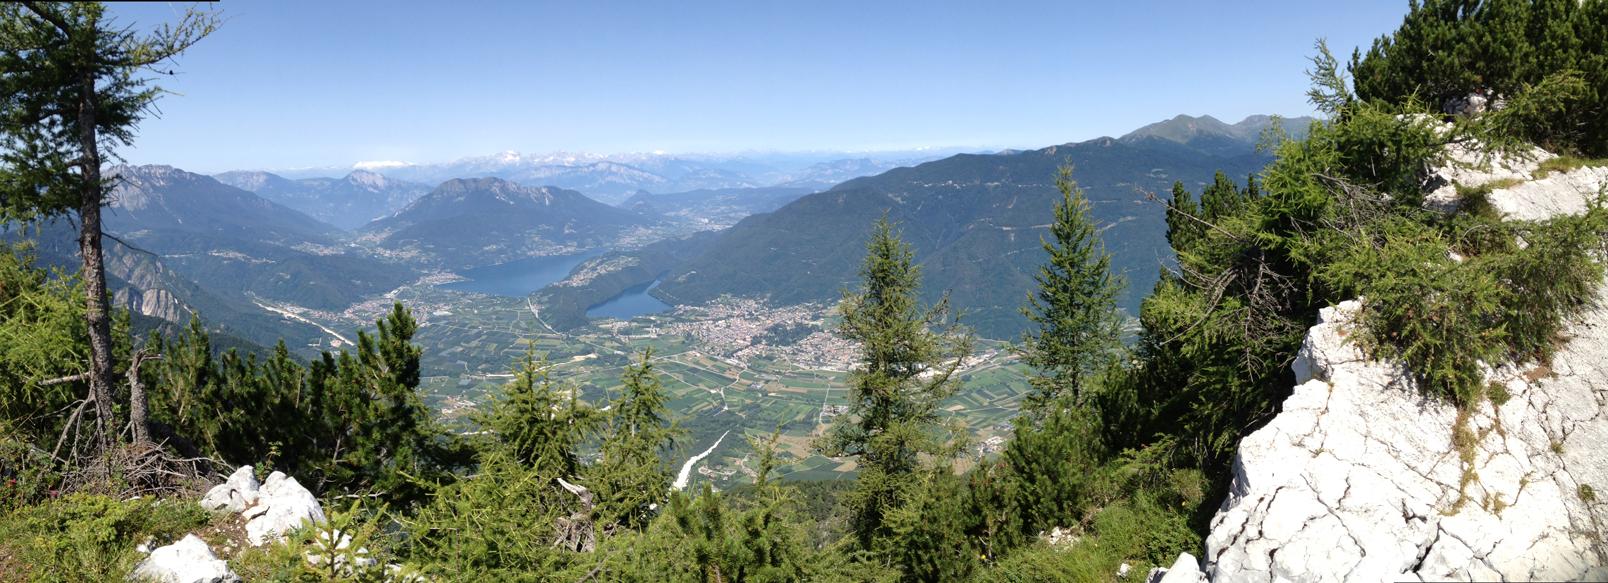 Panoramica dal sentiero